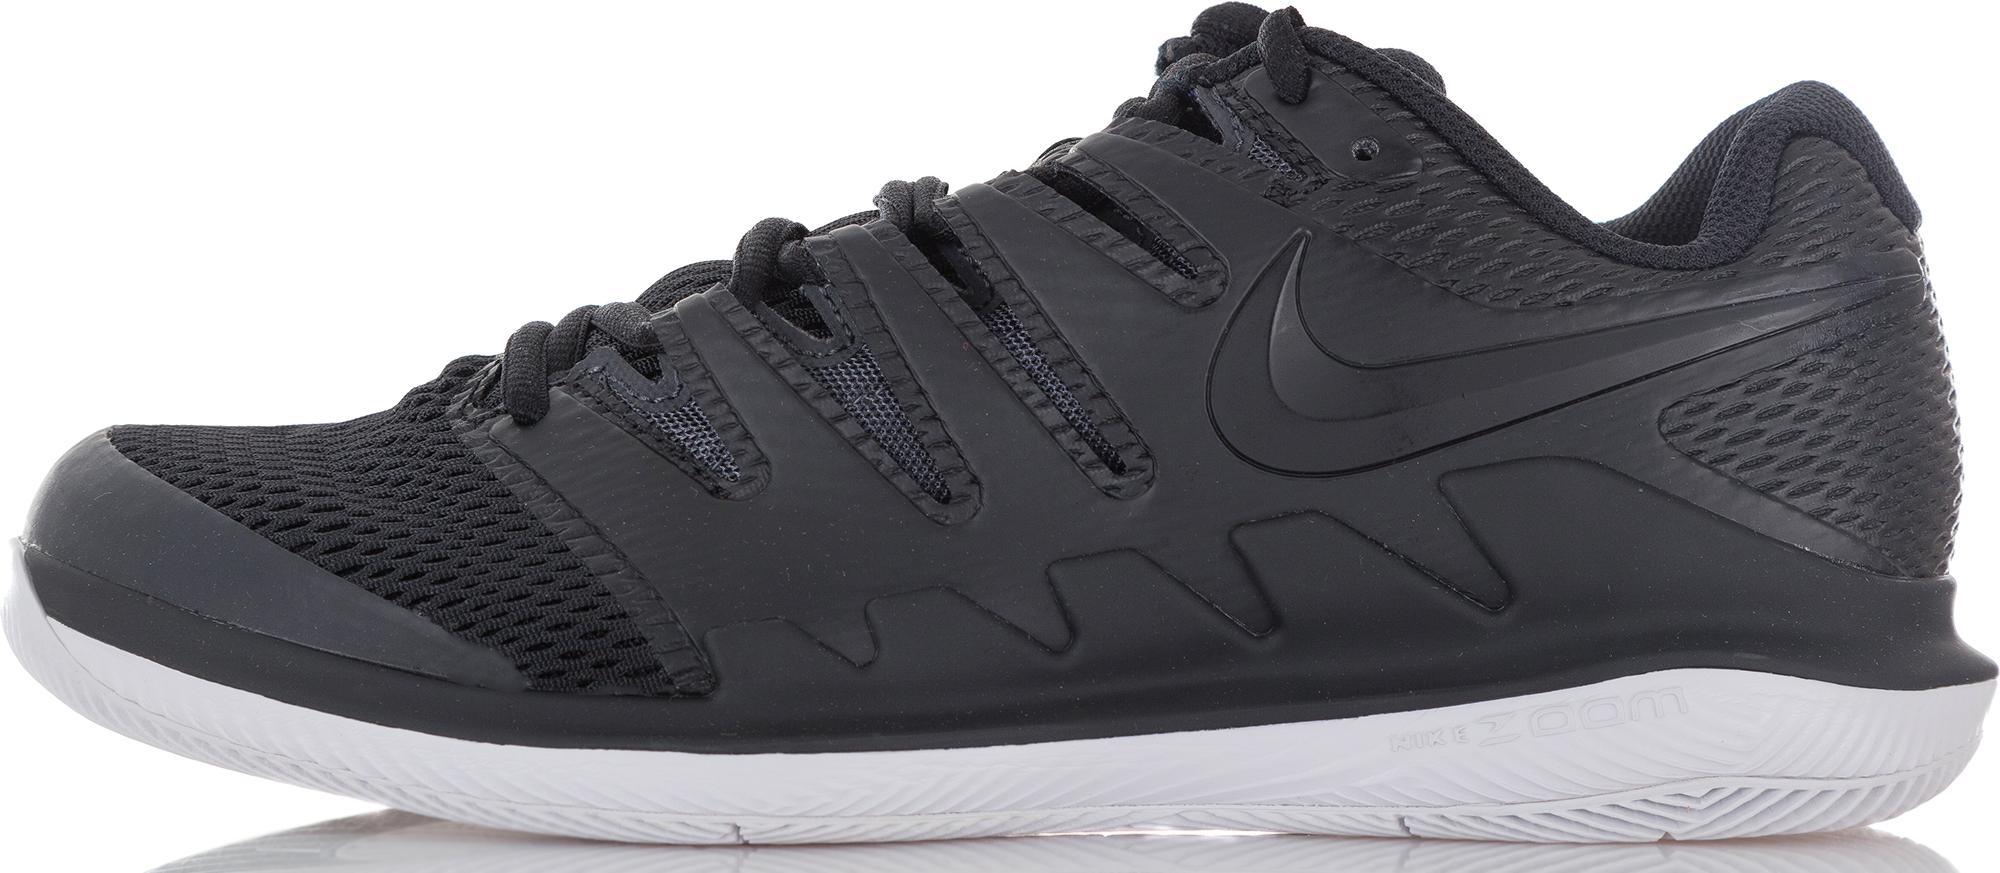 Nike Кроссовки для мальчиков Nike Air Zoom Vapor X Hc, размер 38